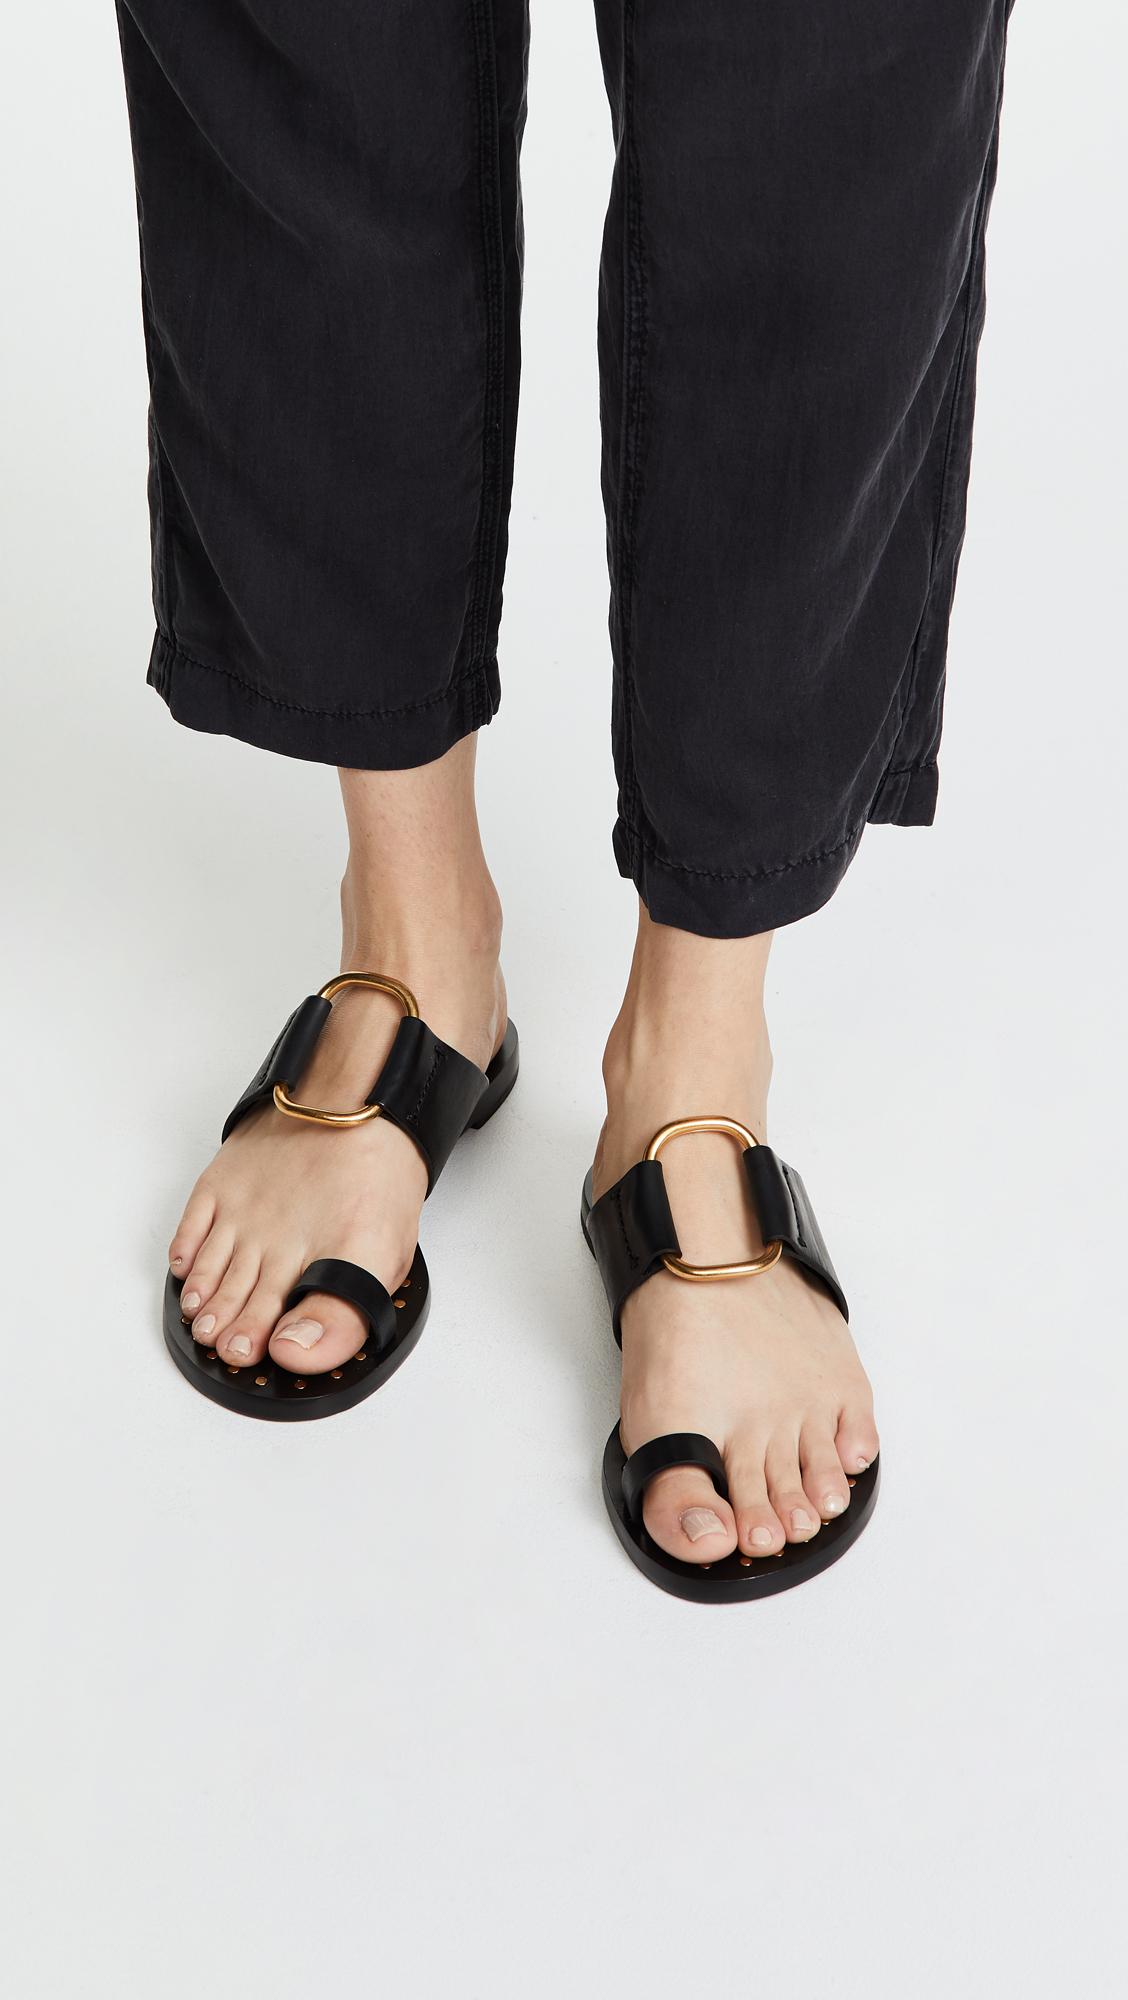 b58a919eaad8 Tory Burch Brannan Toe Ring Sandals